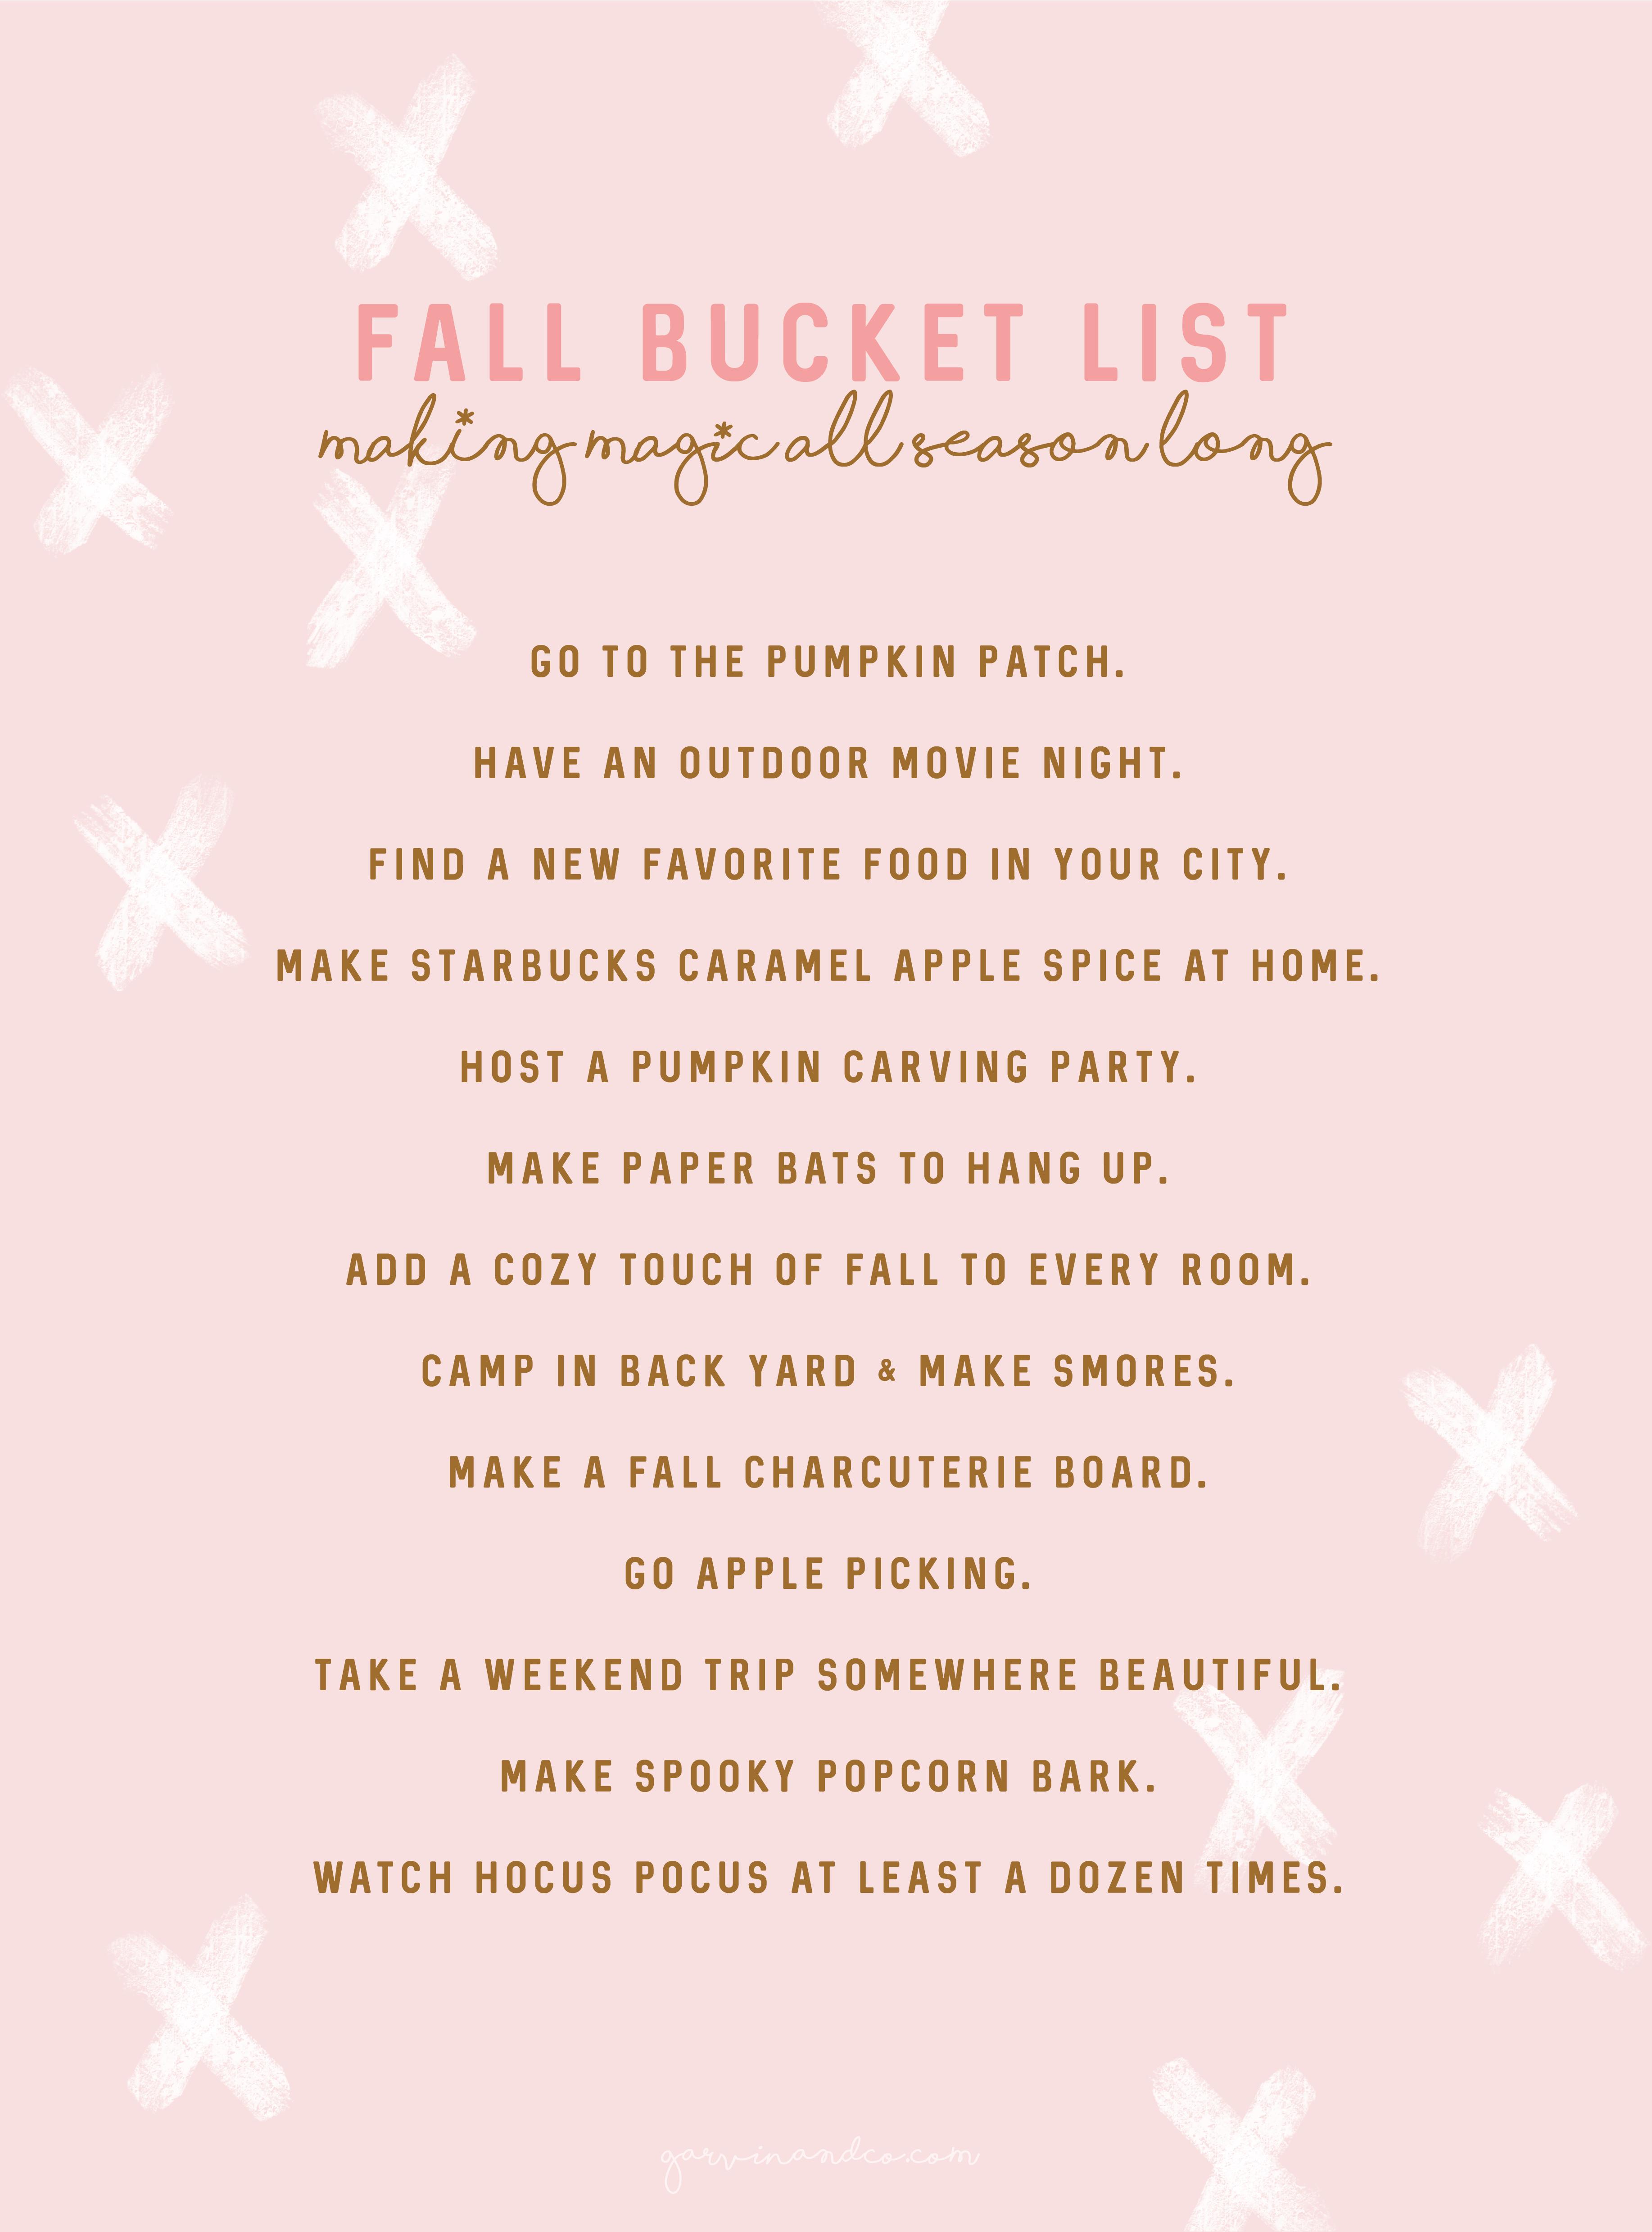 Fall Bucket List 2019 Garvinandco Com